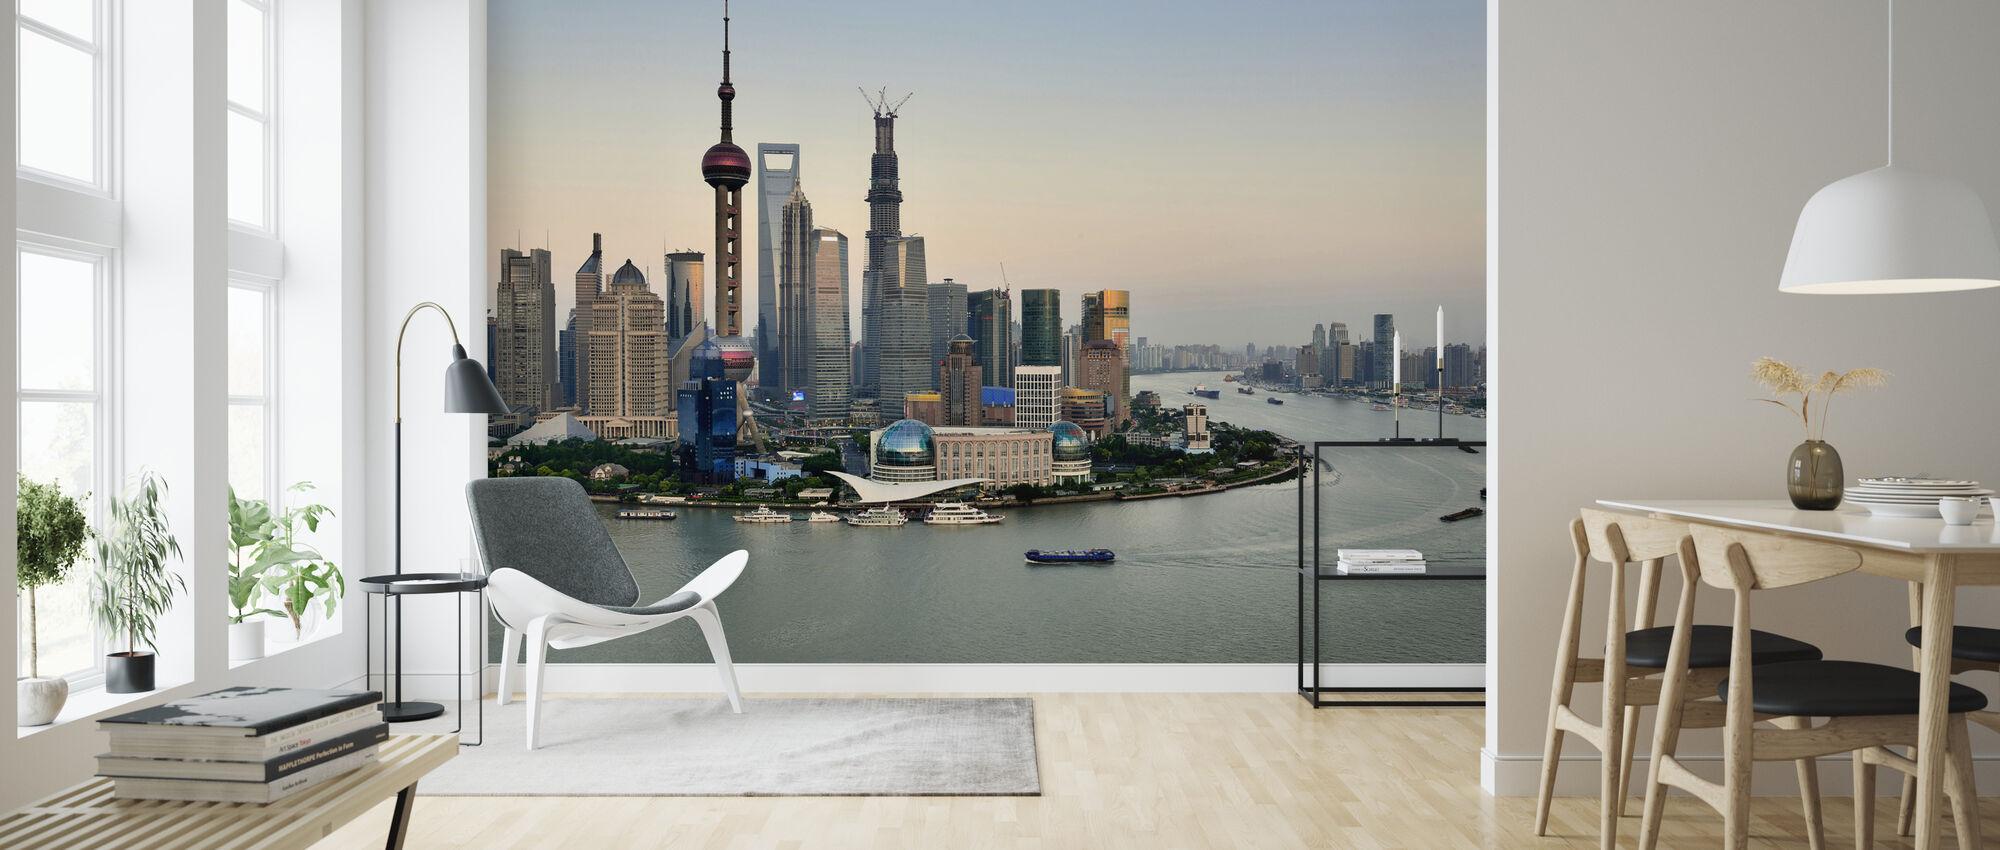 Pearl - Wallpaper - Living Room